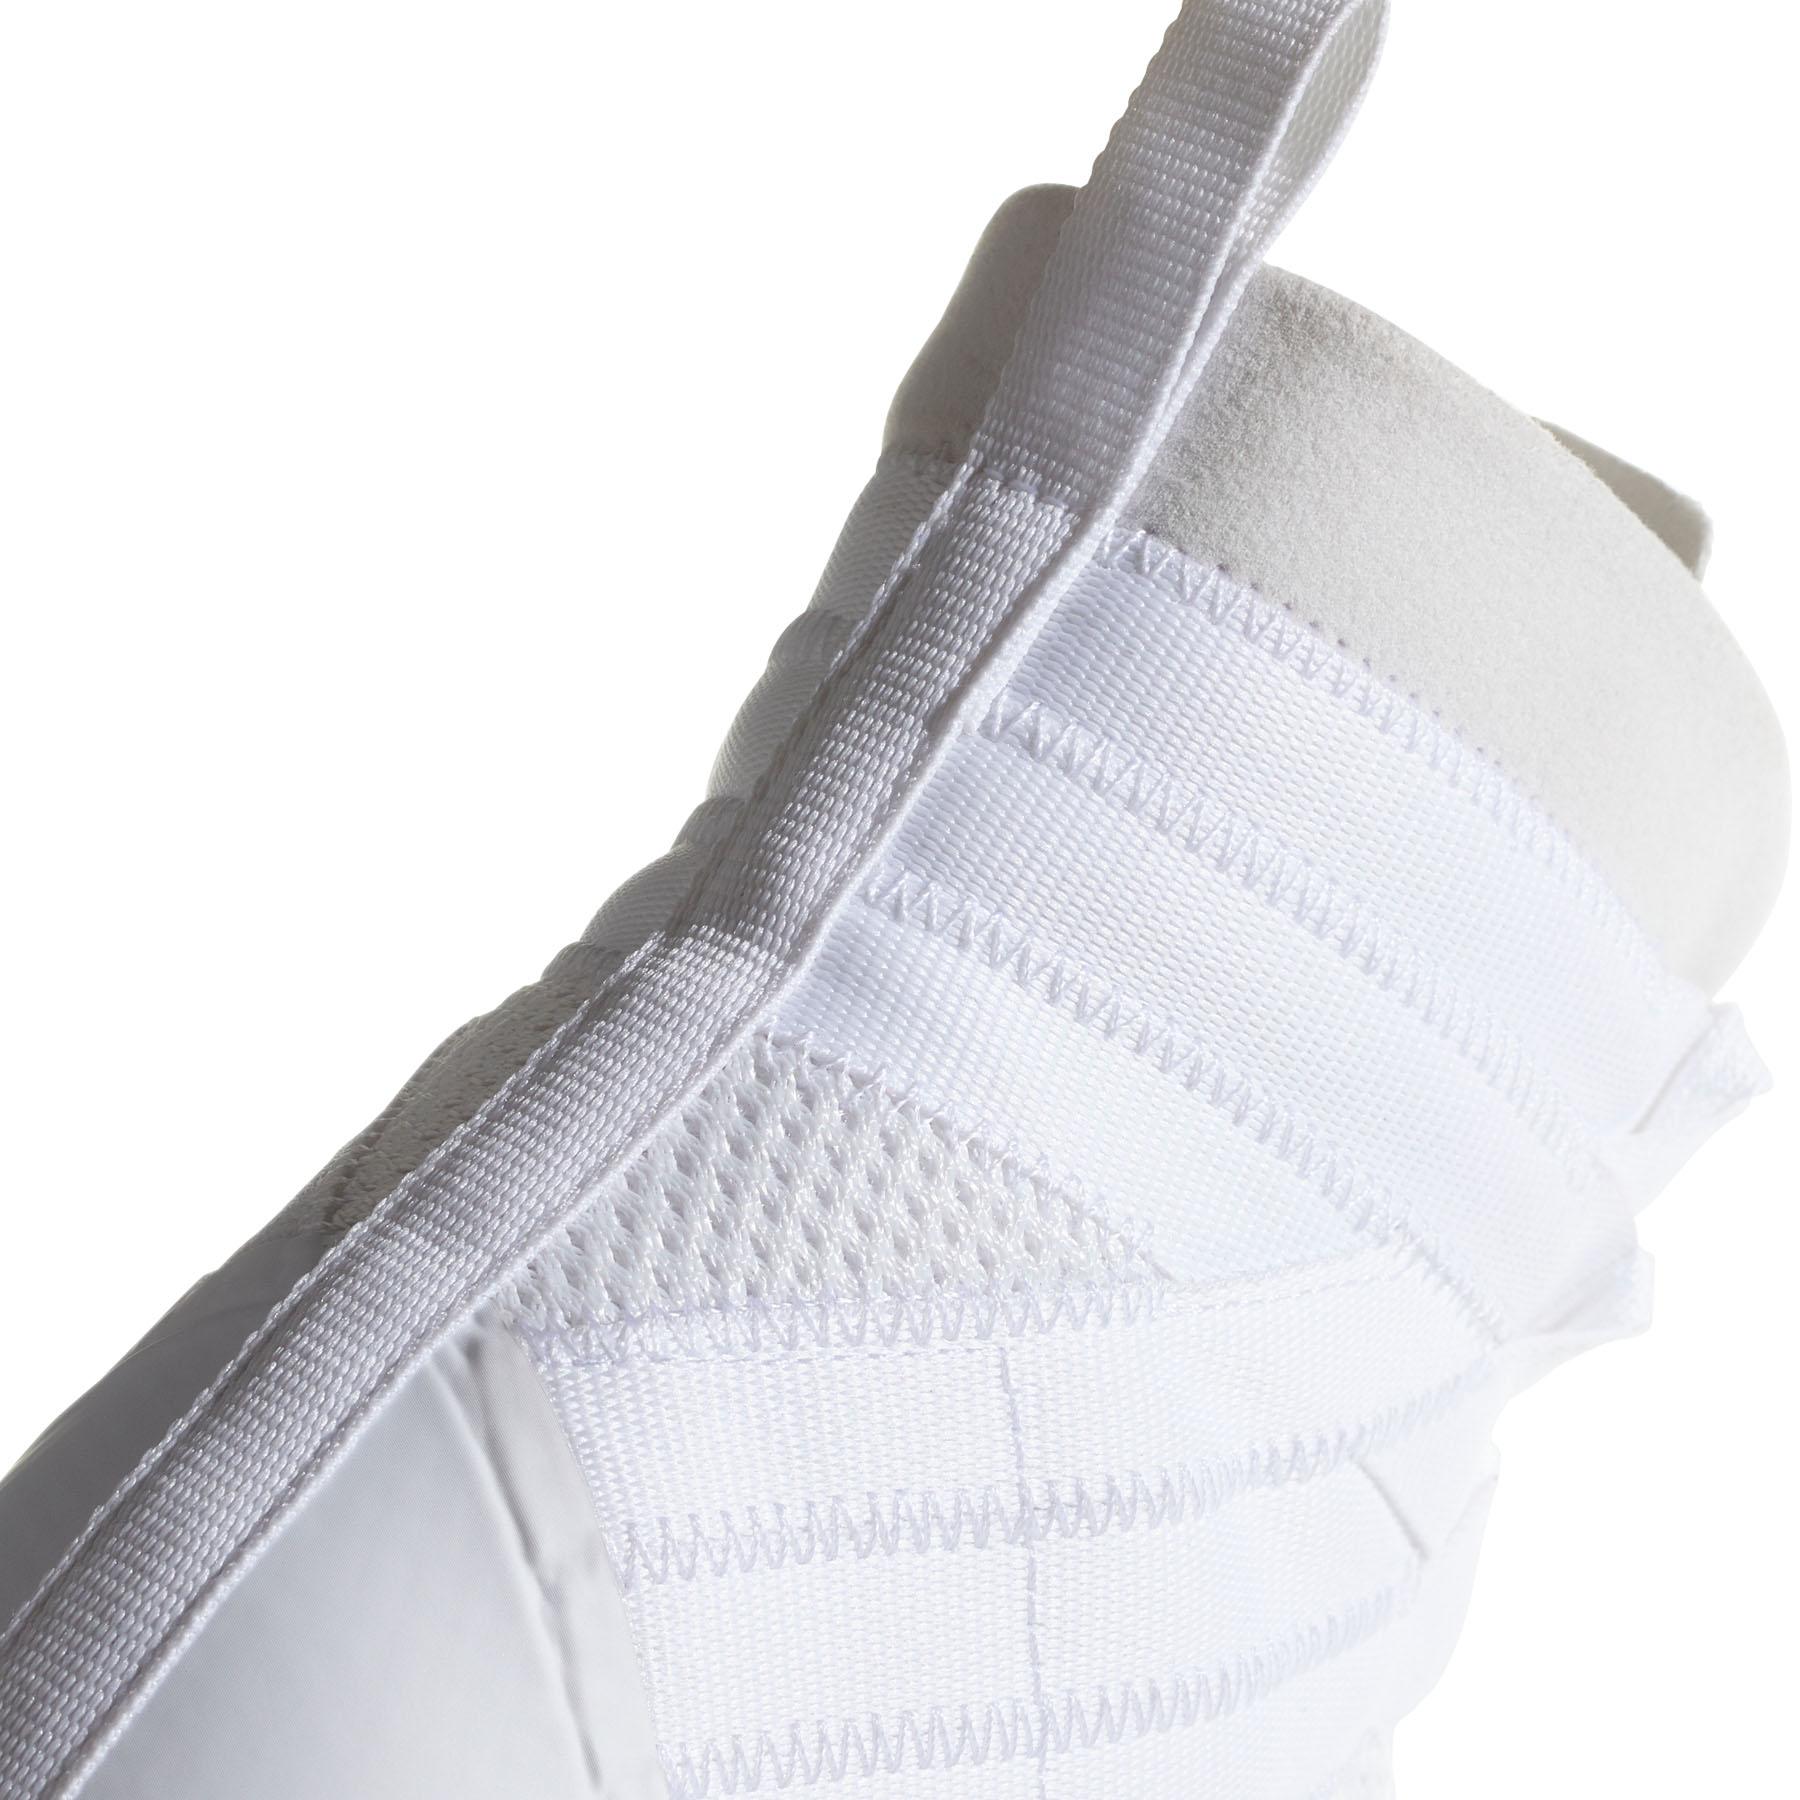 miniature 10 - Adidas speedex 18 Homme Adulte Boxe Trainer Shoe Boot Blanc/Rouge